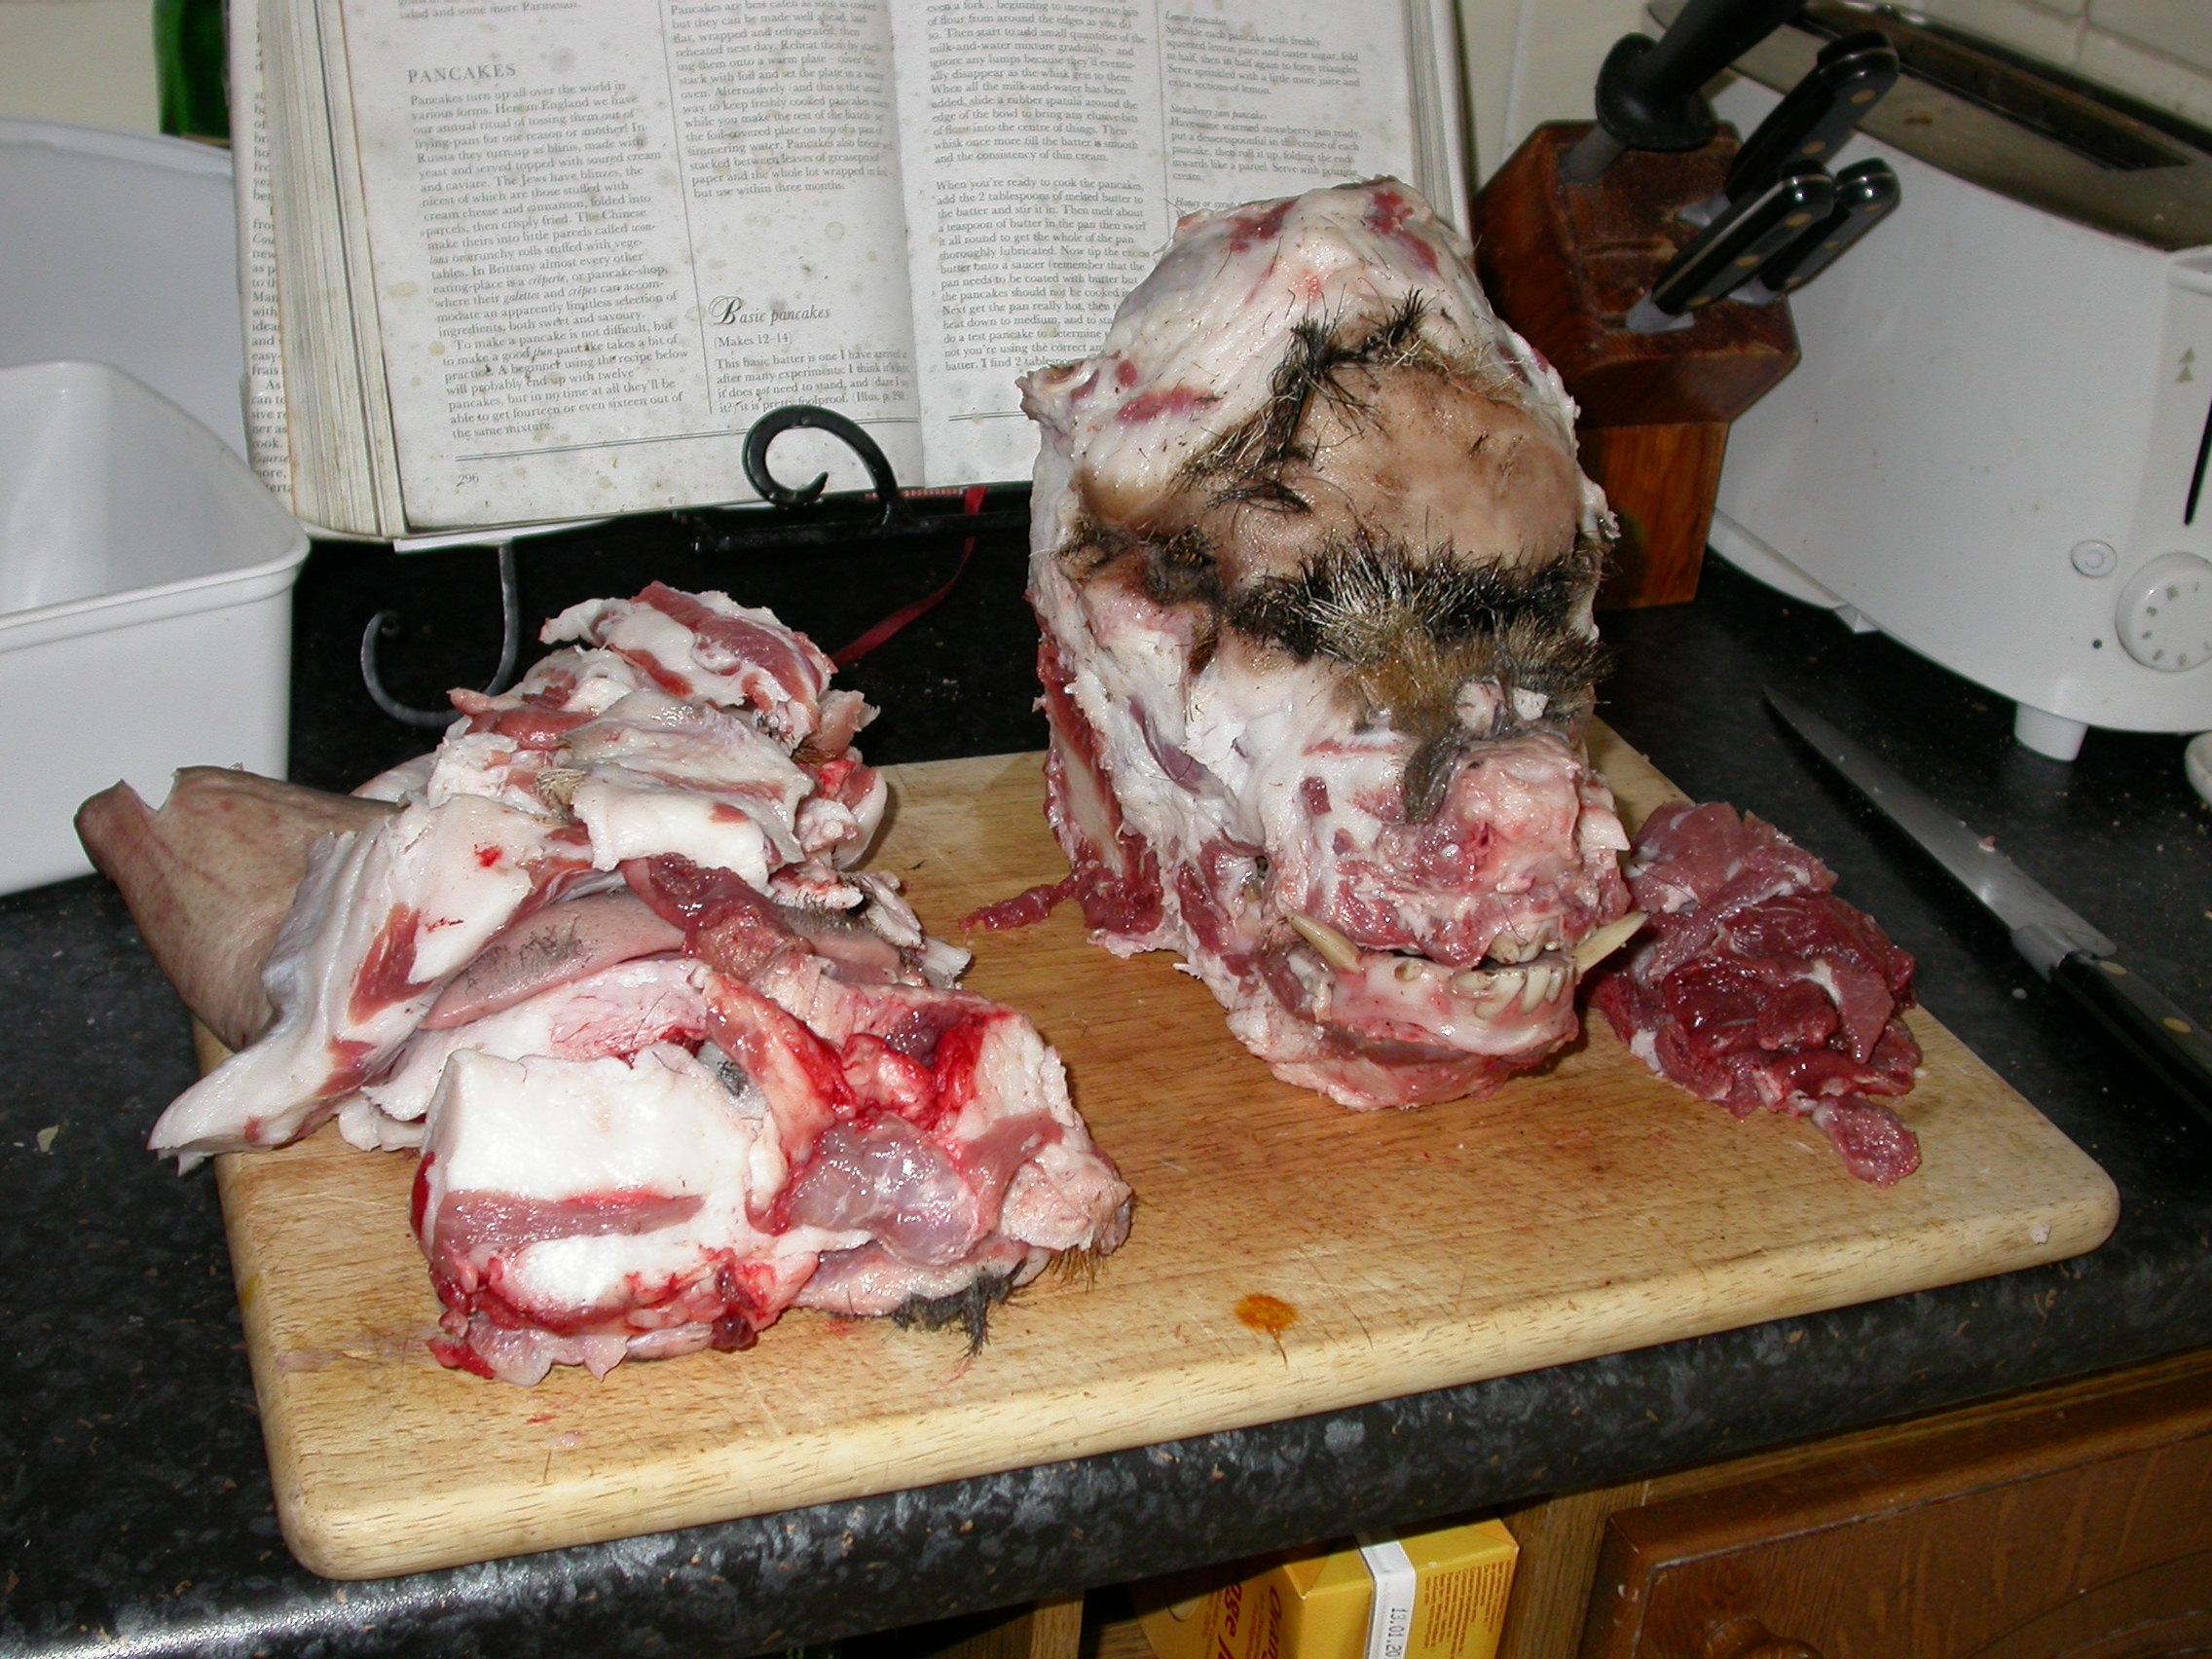 Pig head, defleshed